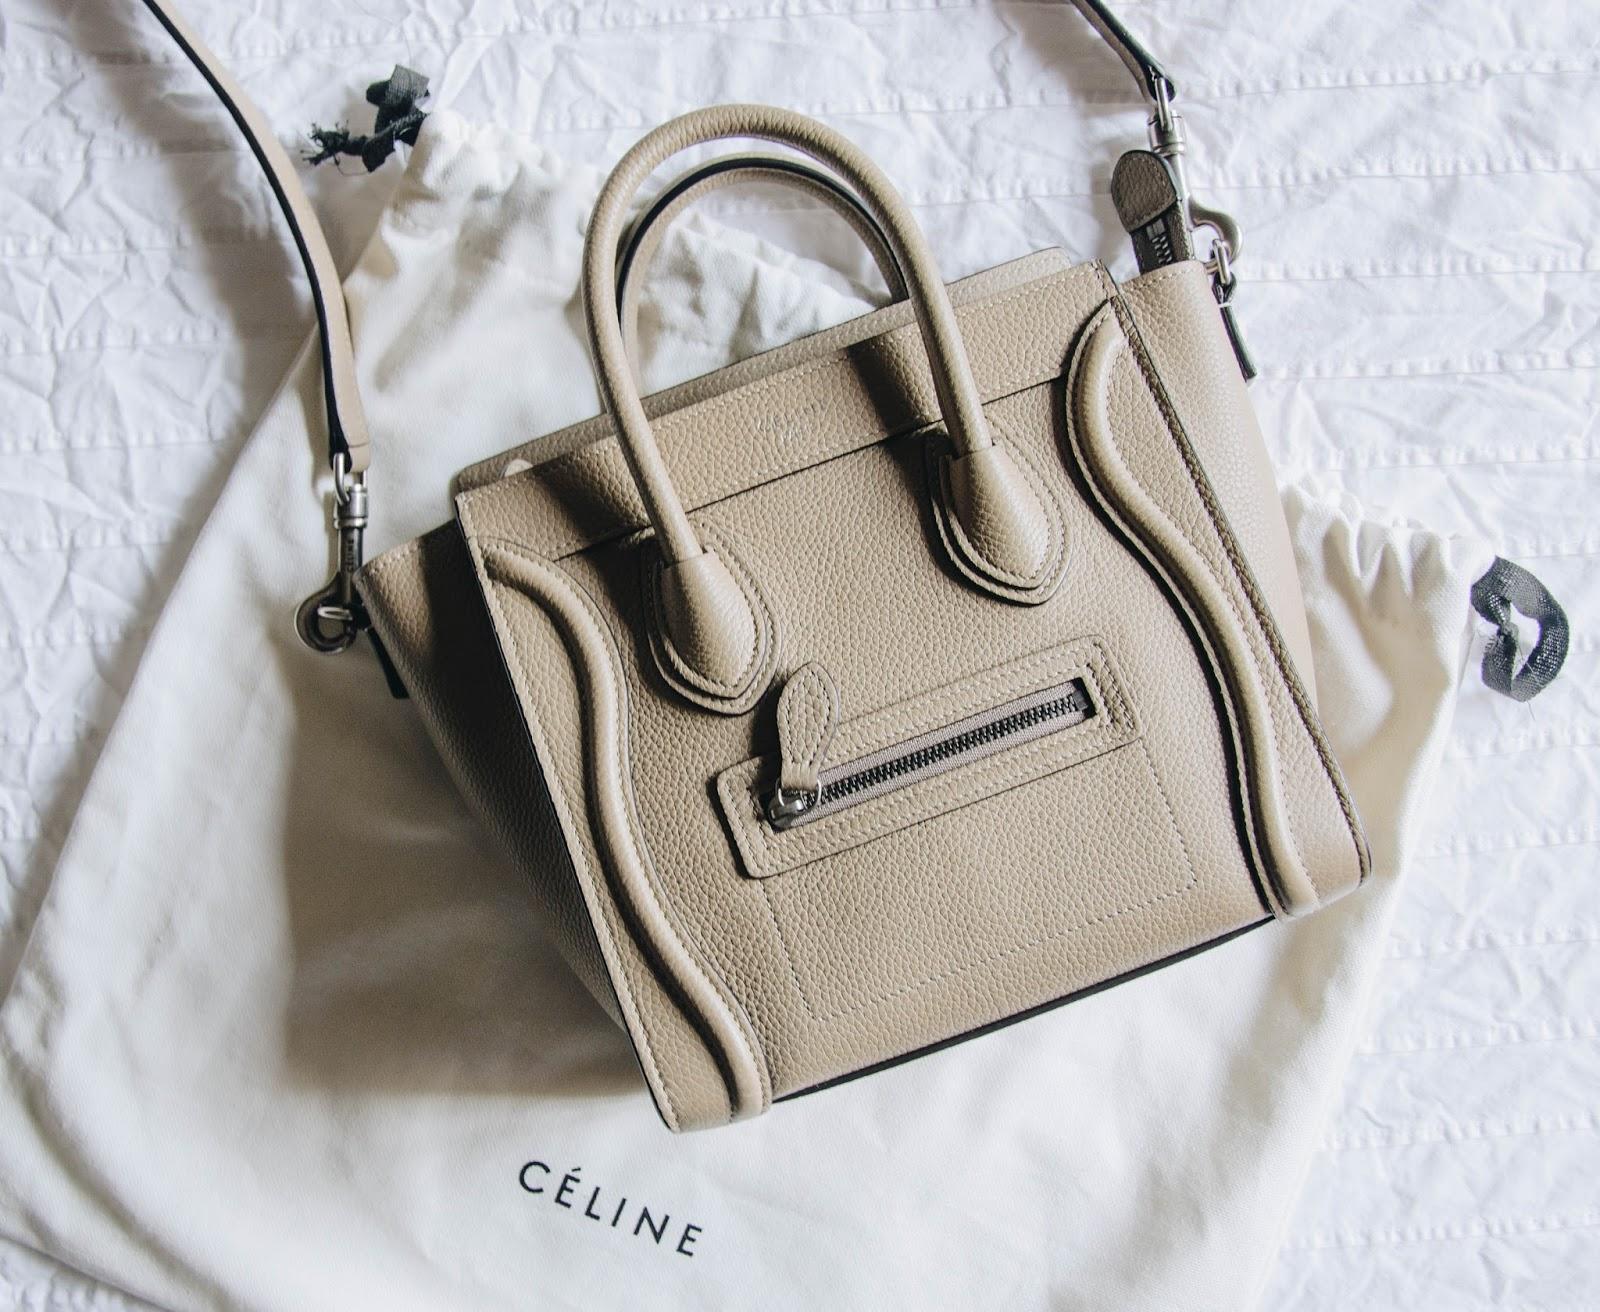 Céline Nano Luggage Tote Review 97564e459eacd